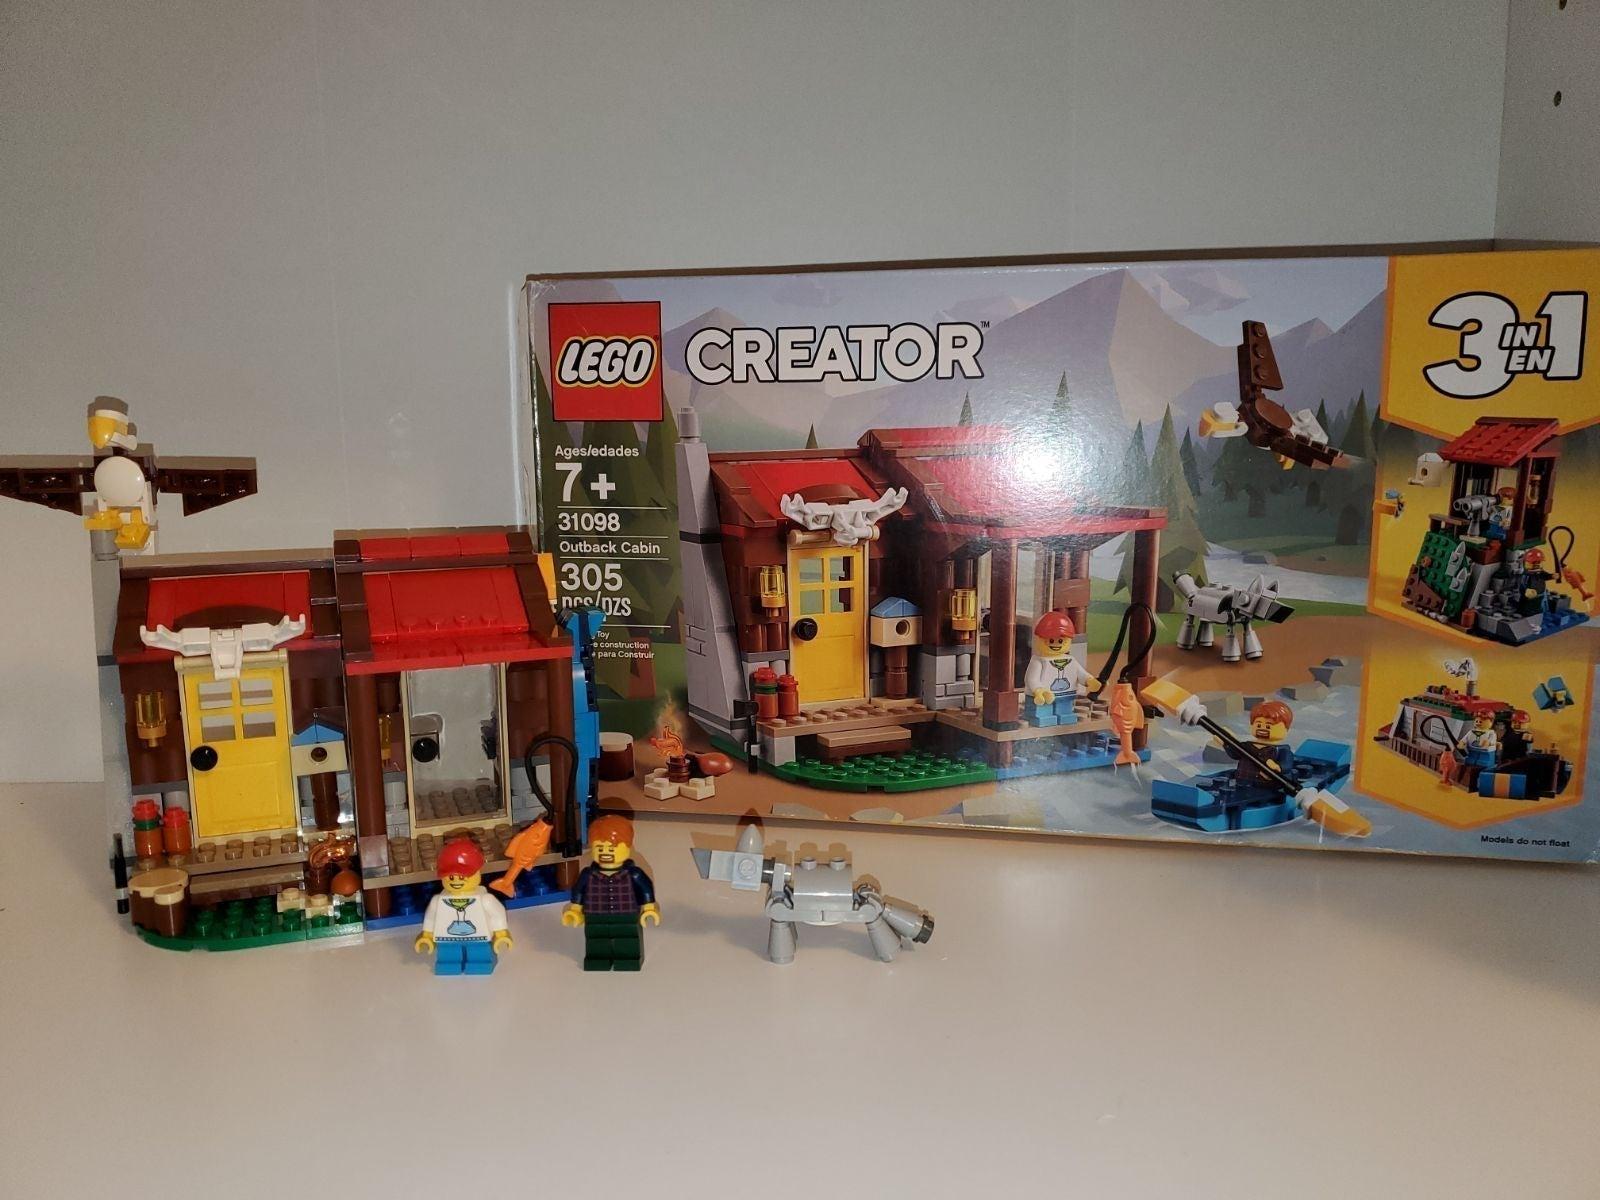 LEGO Creator 3-in-1:  Outback Cabin